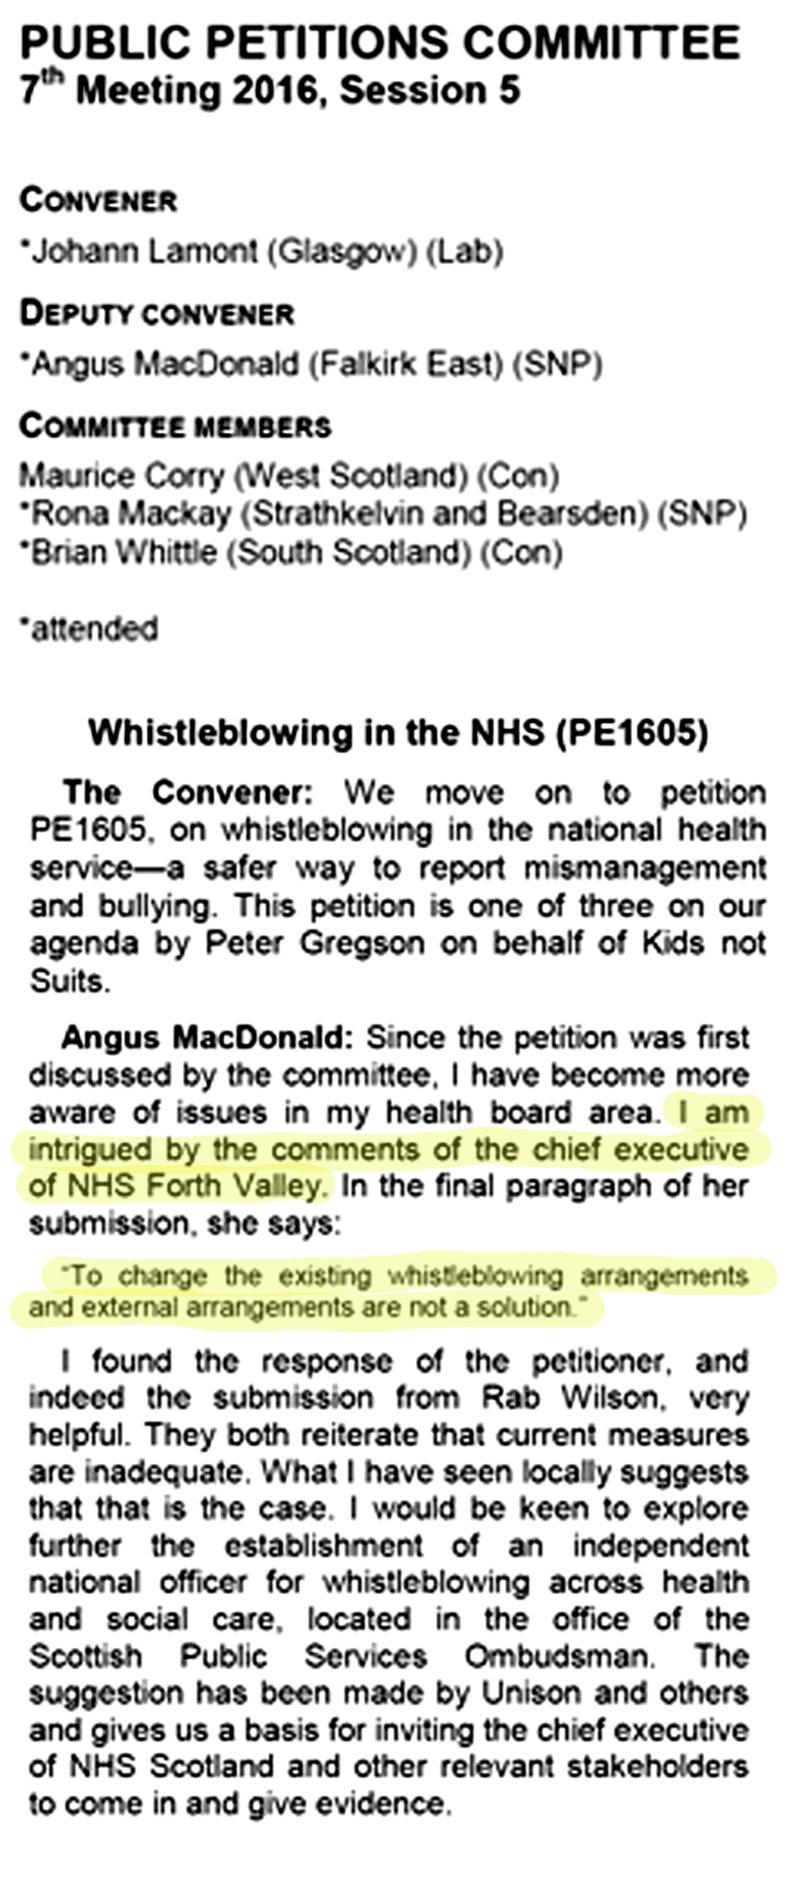 pe1605-nhs-scotland-whistlblowing-jane-grant-nhs-forth-valley